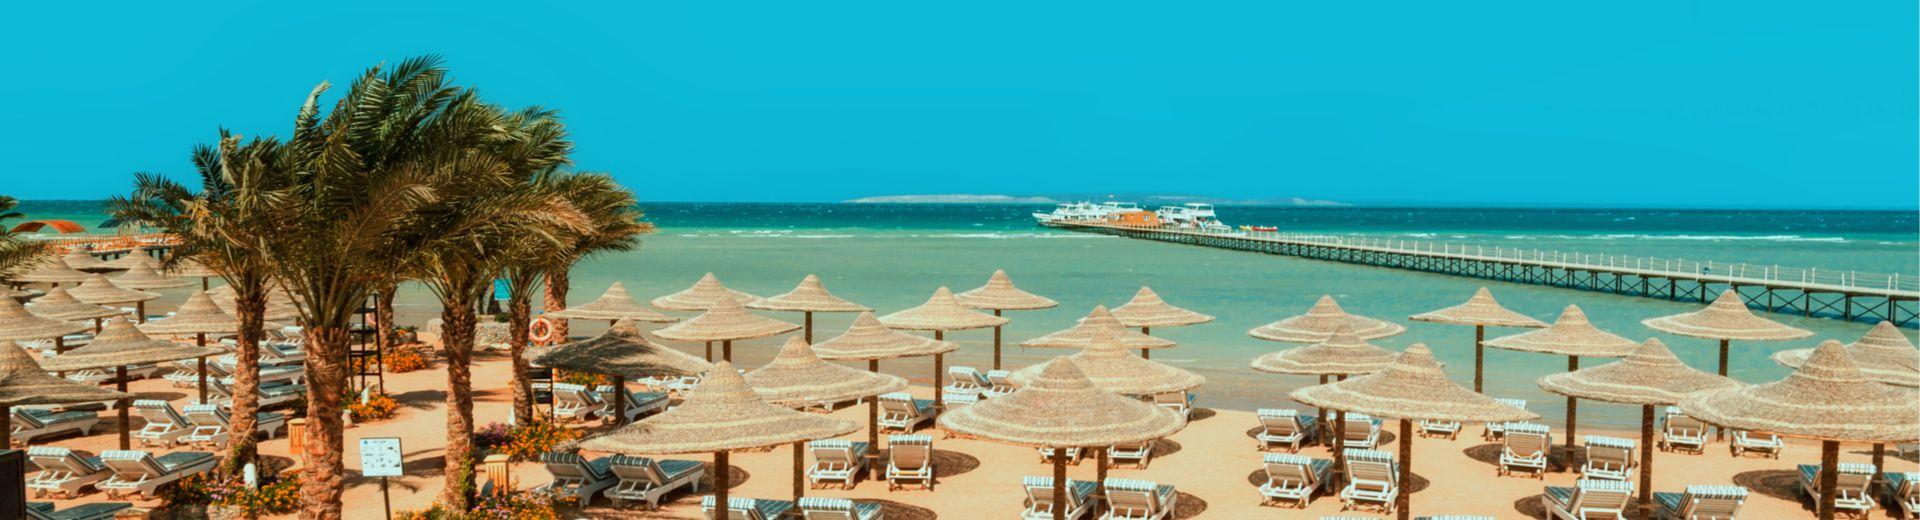 Luxus in Ägypten zum Top-Preis